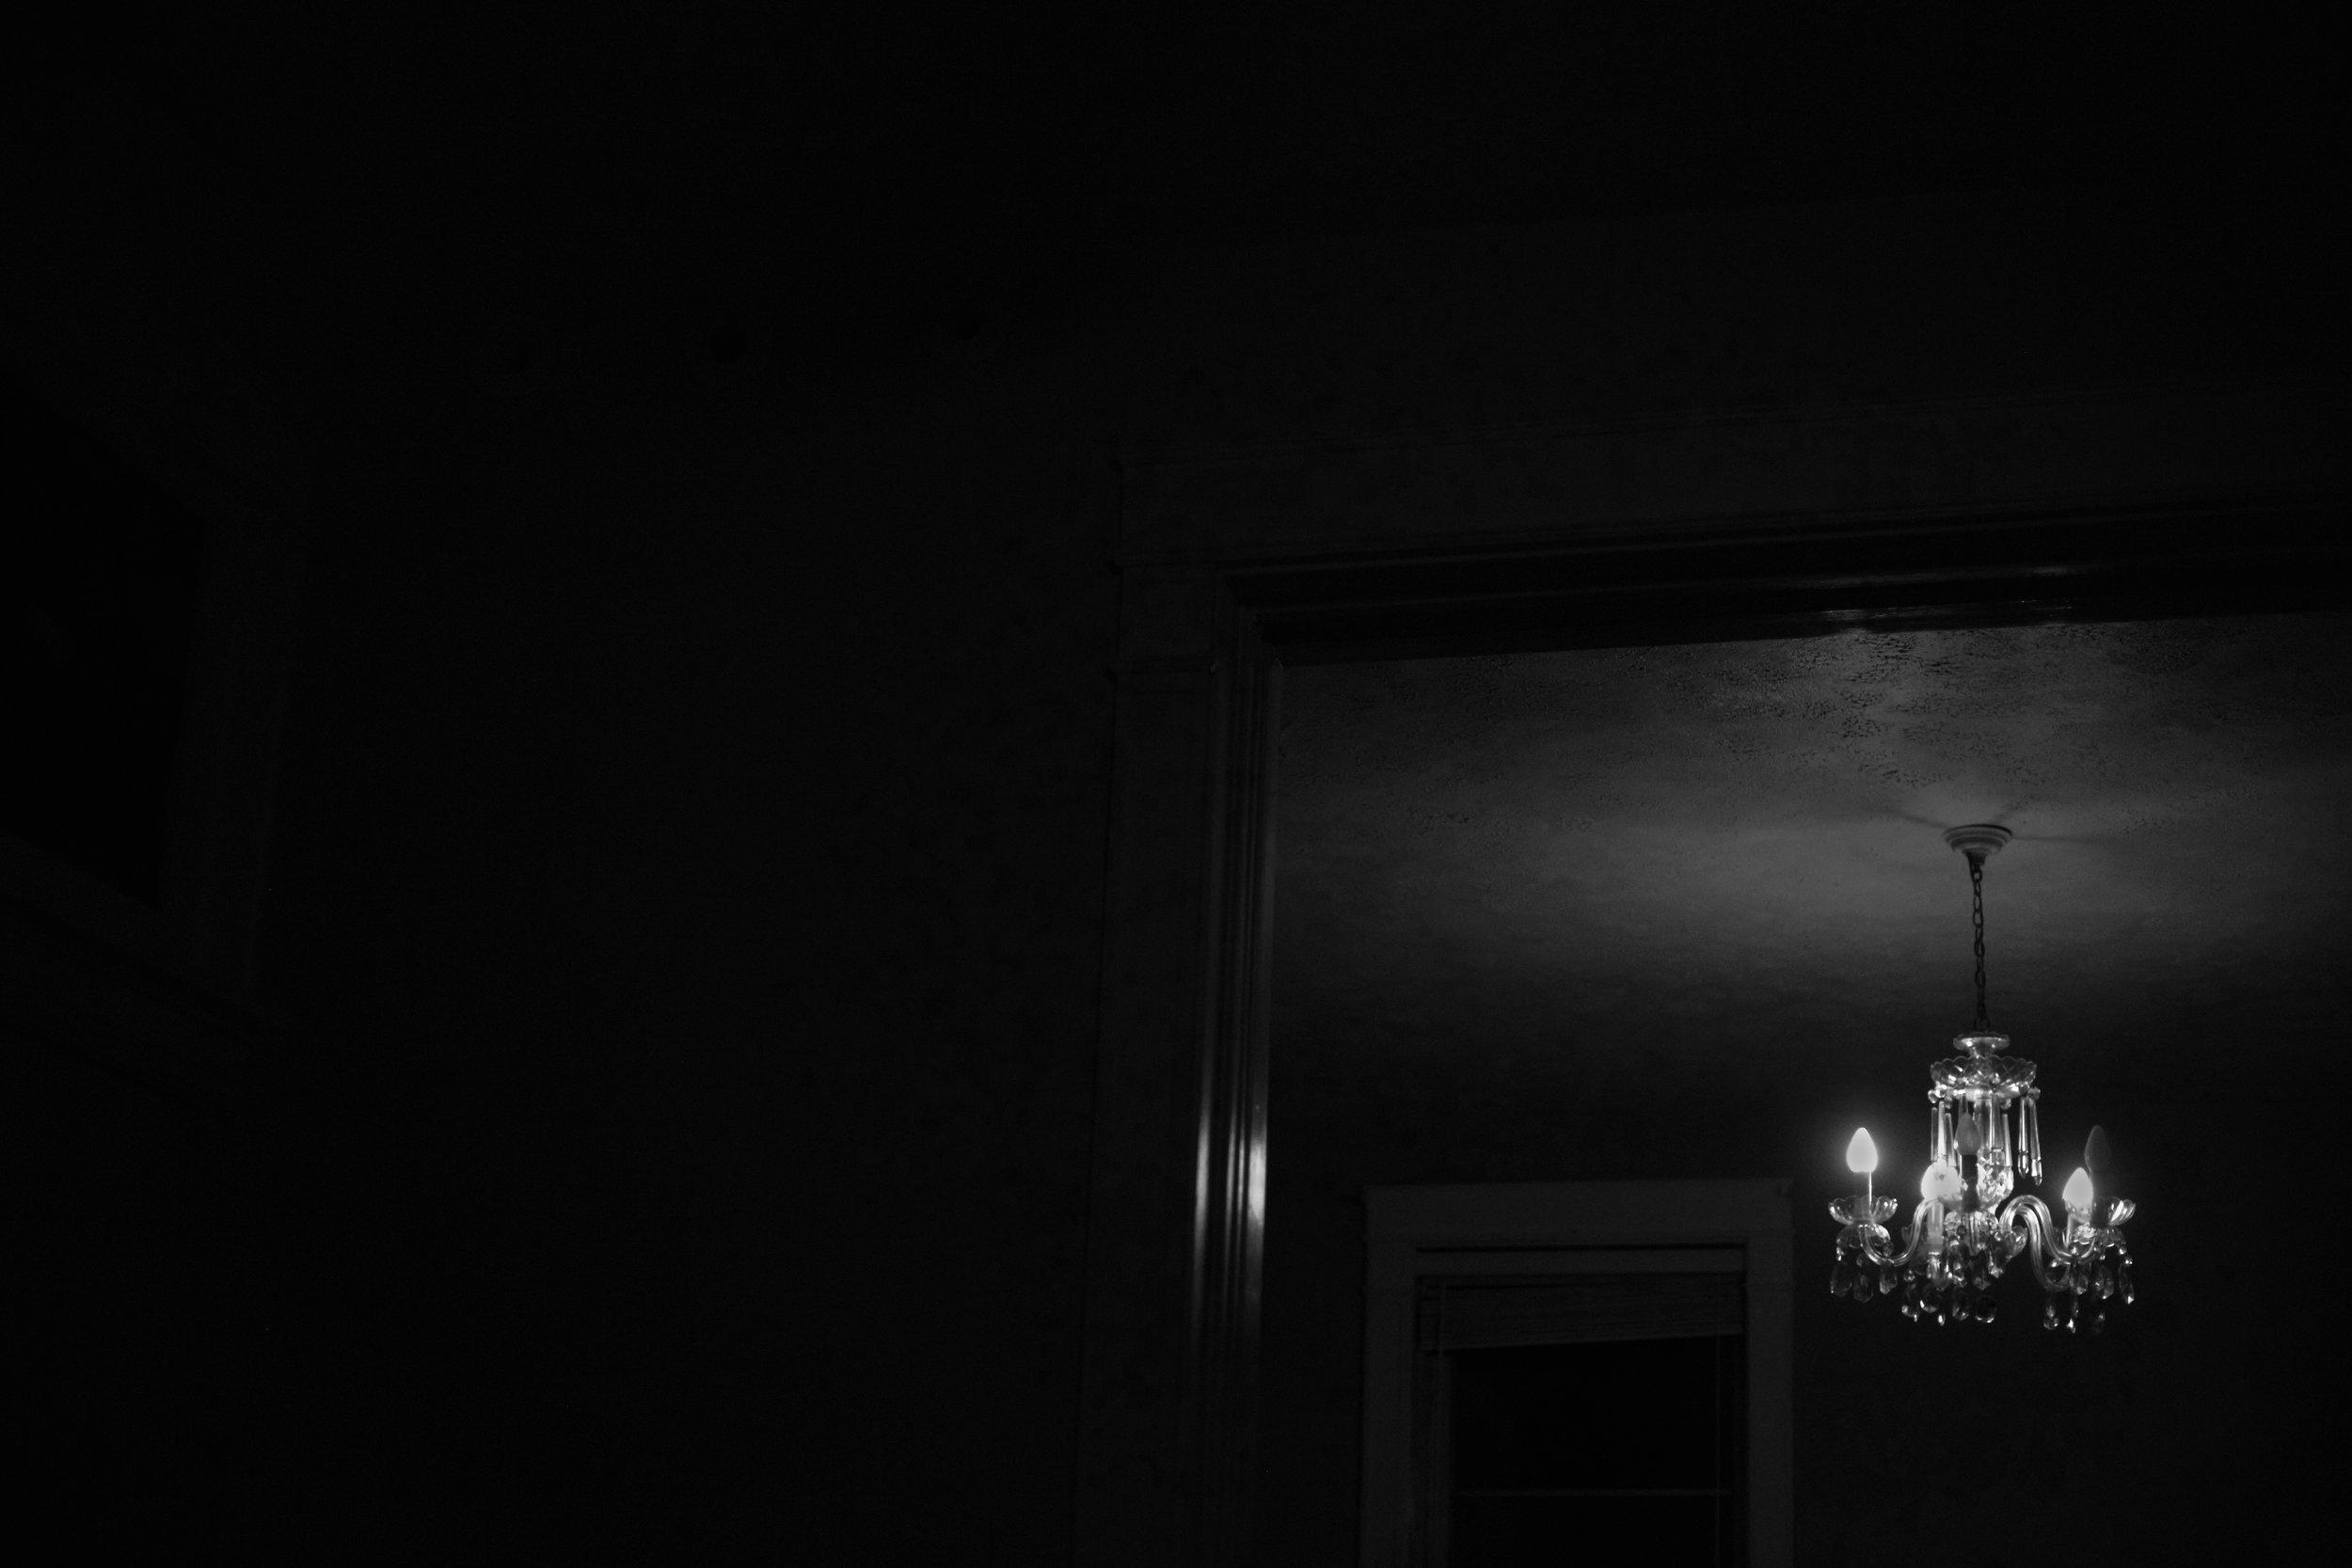 LTL_17_Lamp_St.Louis.jpg